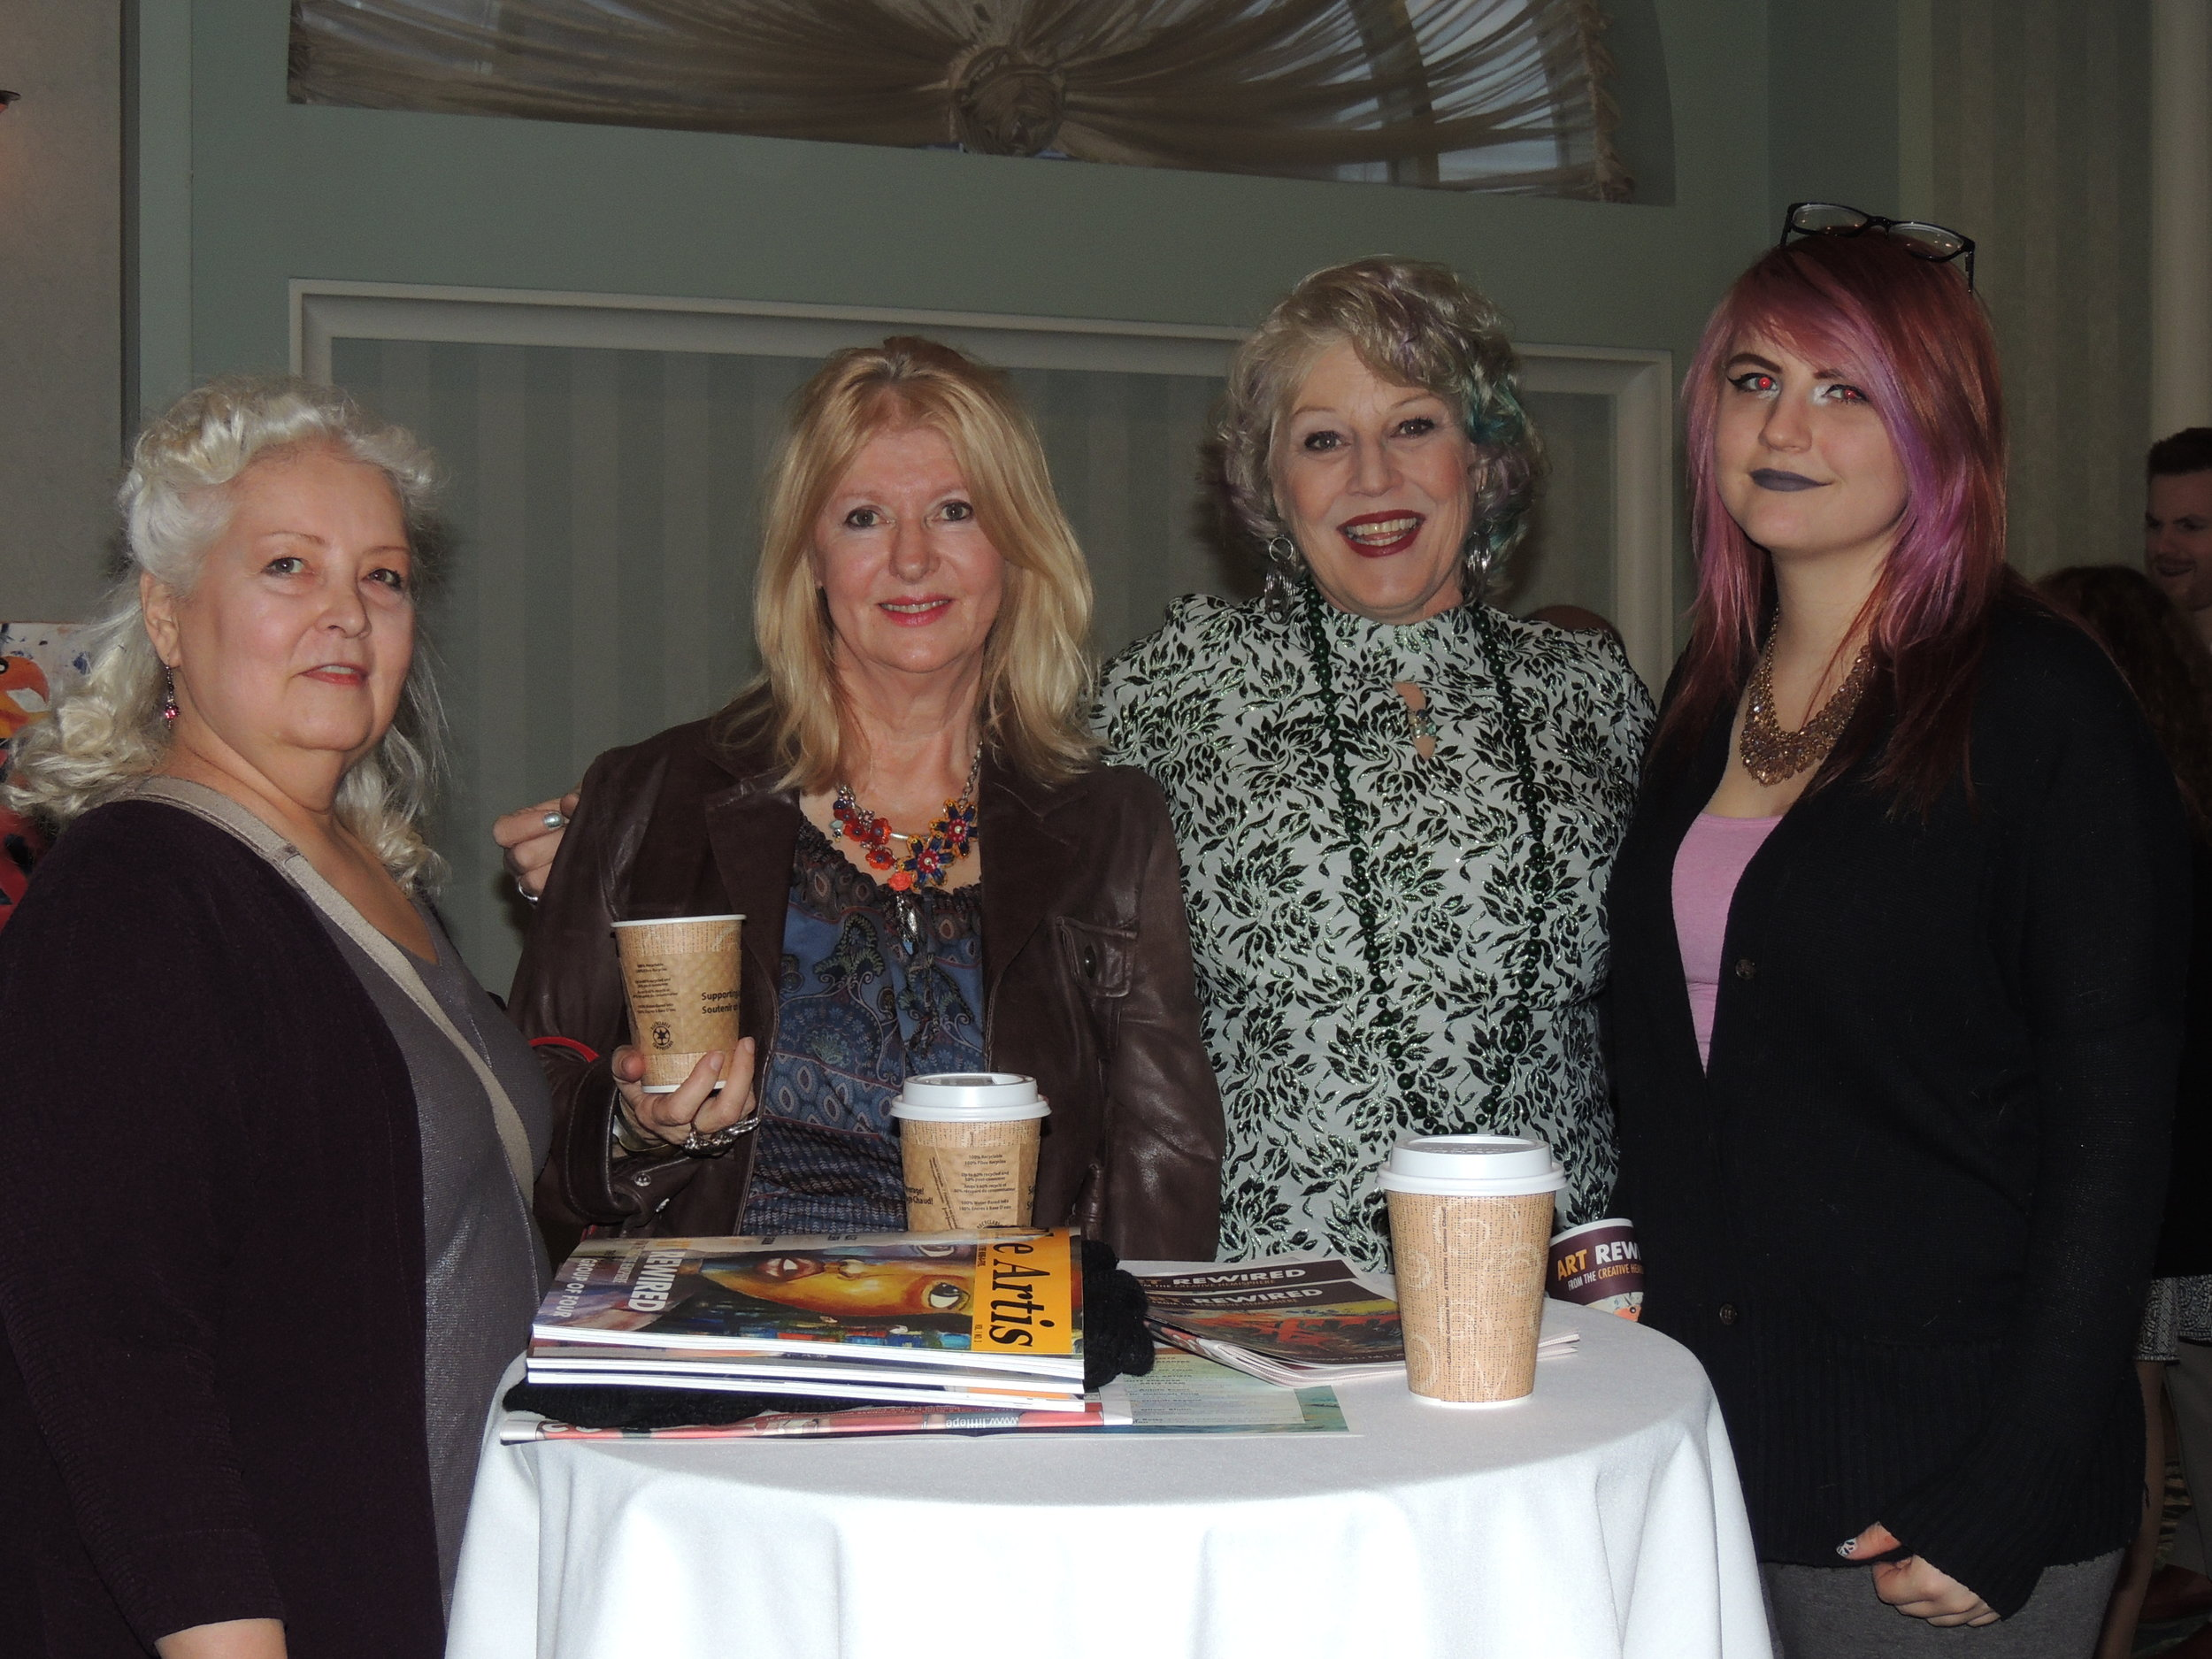 Contributing artists Eva Kolacz & Kim Cayer, with fellow artists Cheyenne & Susan. Photo by Mira Louis.